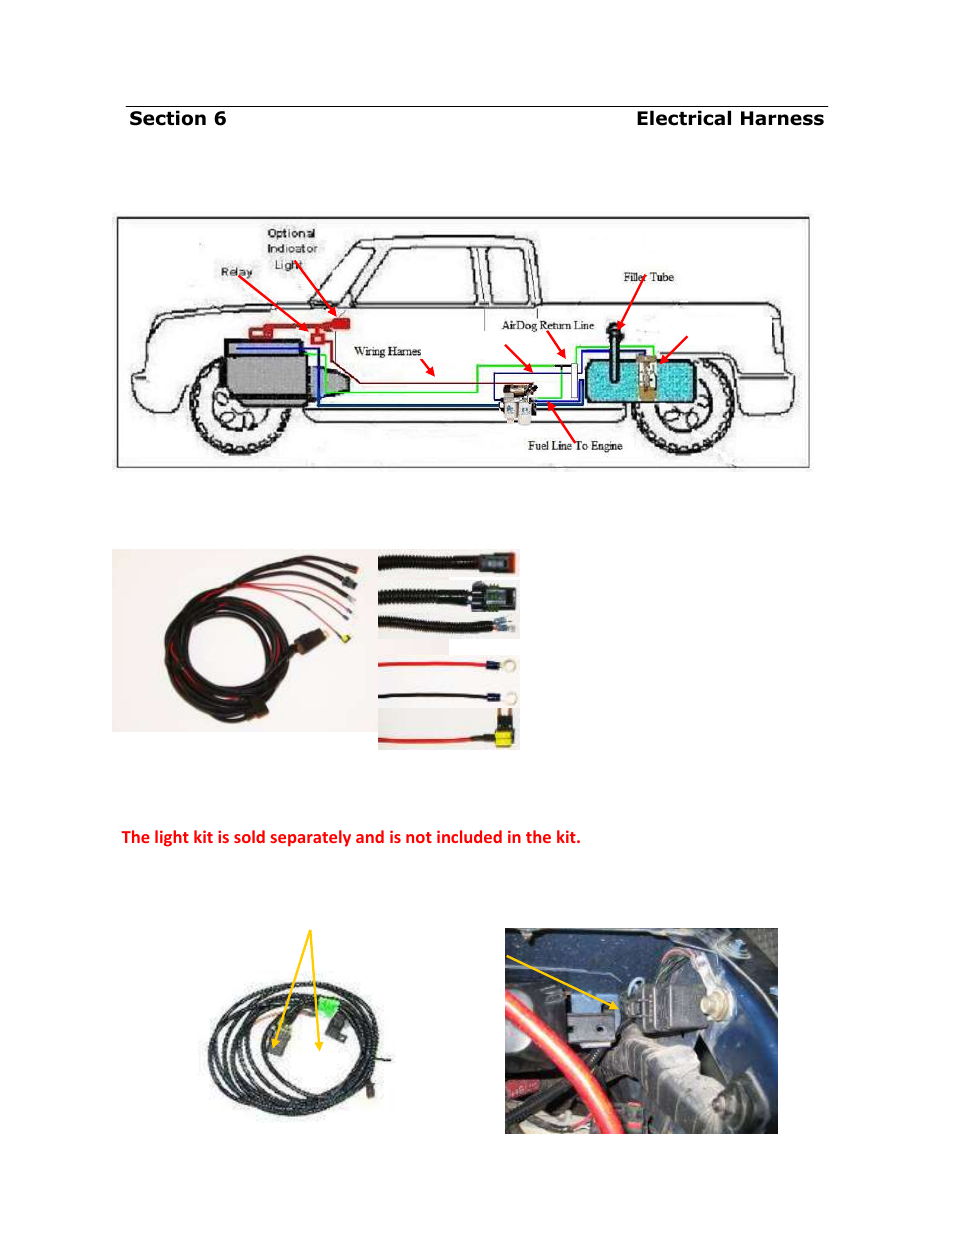 The airdog, Pureflow airdog airdog, Wiring diagram (in red) | PureFlow  AirDog DF-200 - GM Duramax 2011-2014 User Manual | Page 15 / 24